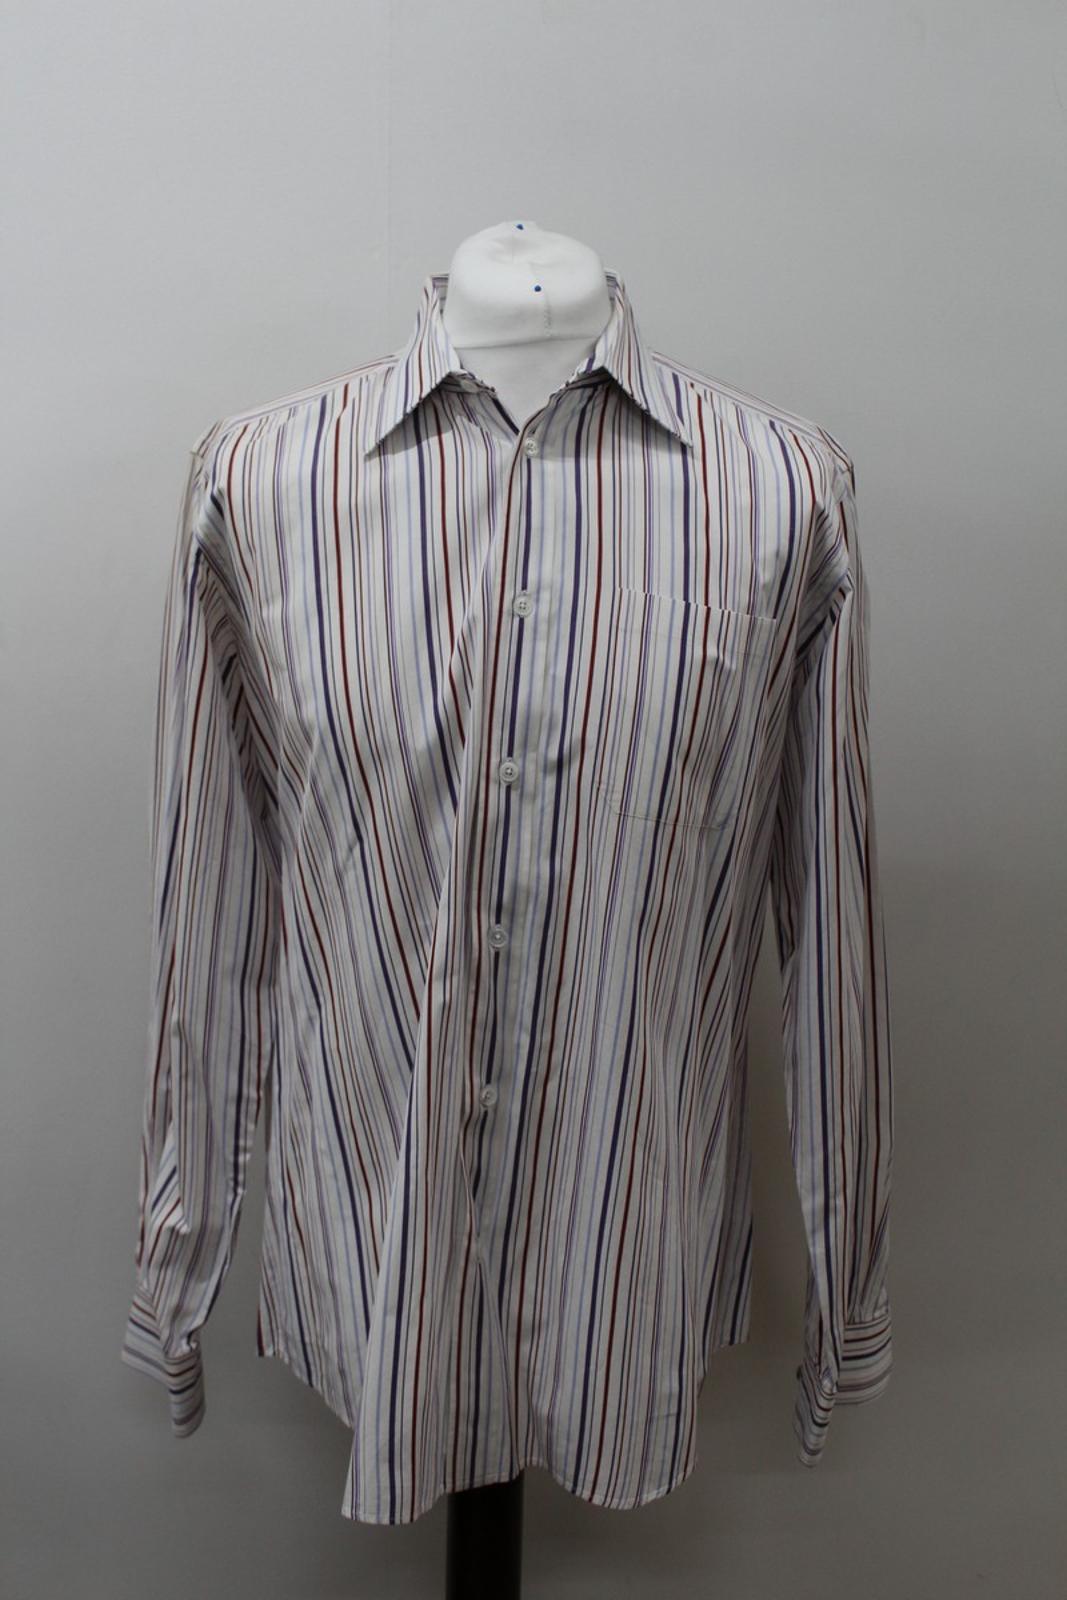 Hermes-para-hombre-Multi-Color-a-rayas-de-algodon-camisa-de-mangas-largas-cuello-16-5-034-42cm miniatura 7